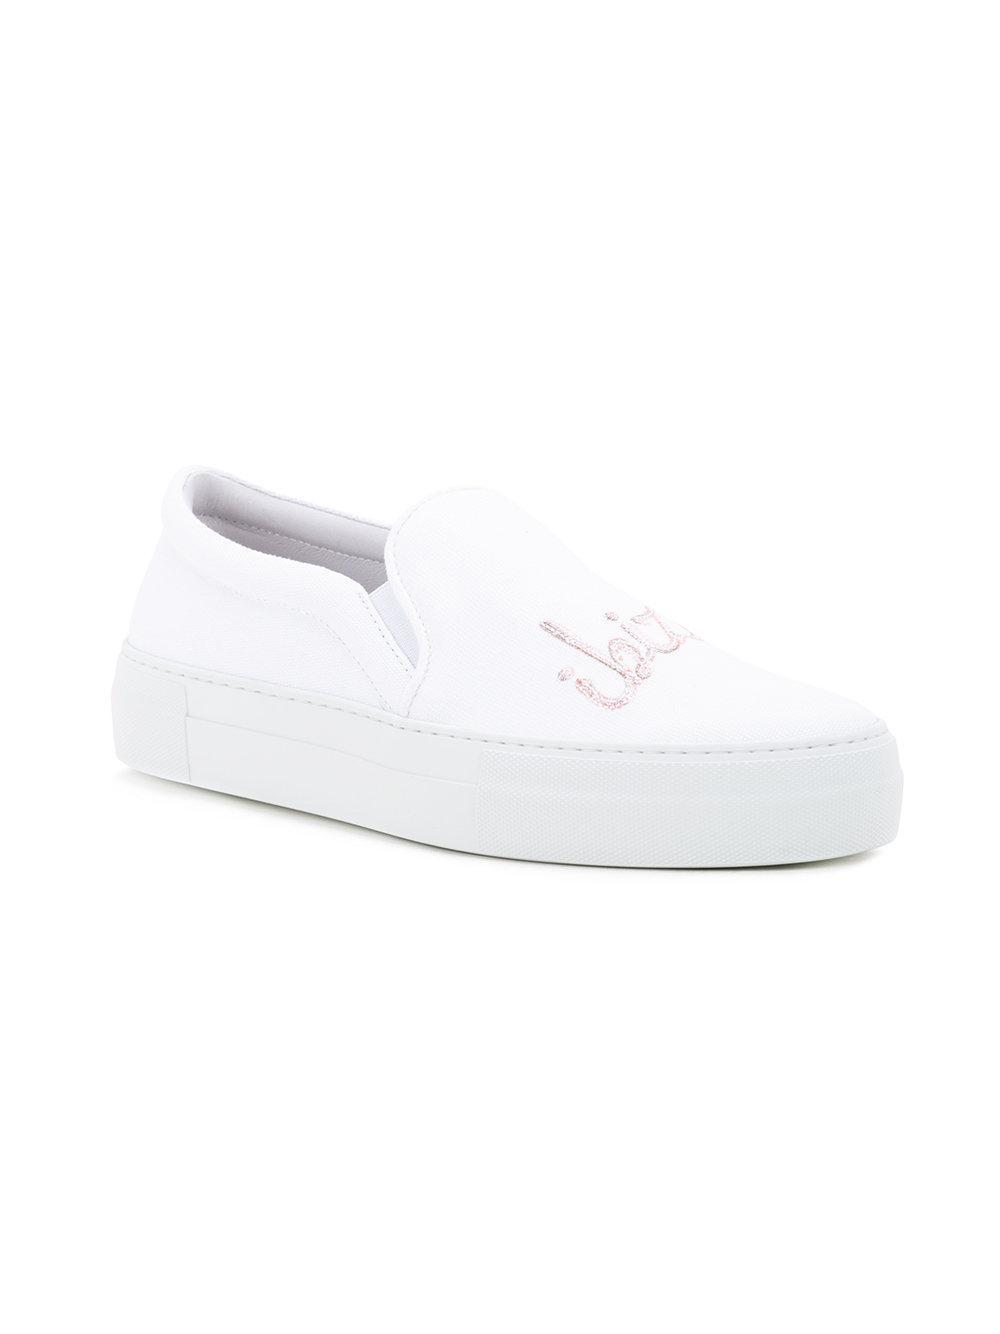 Joshua Sanders Cotton Ibiza Slip-on Sneakers in White